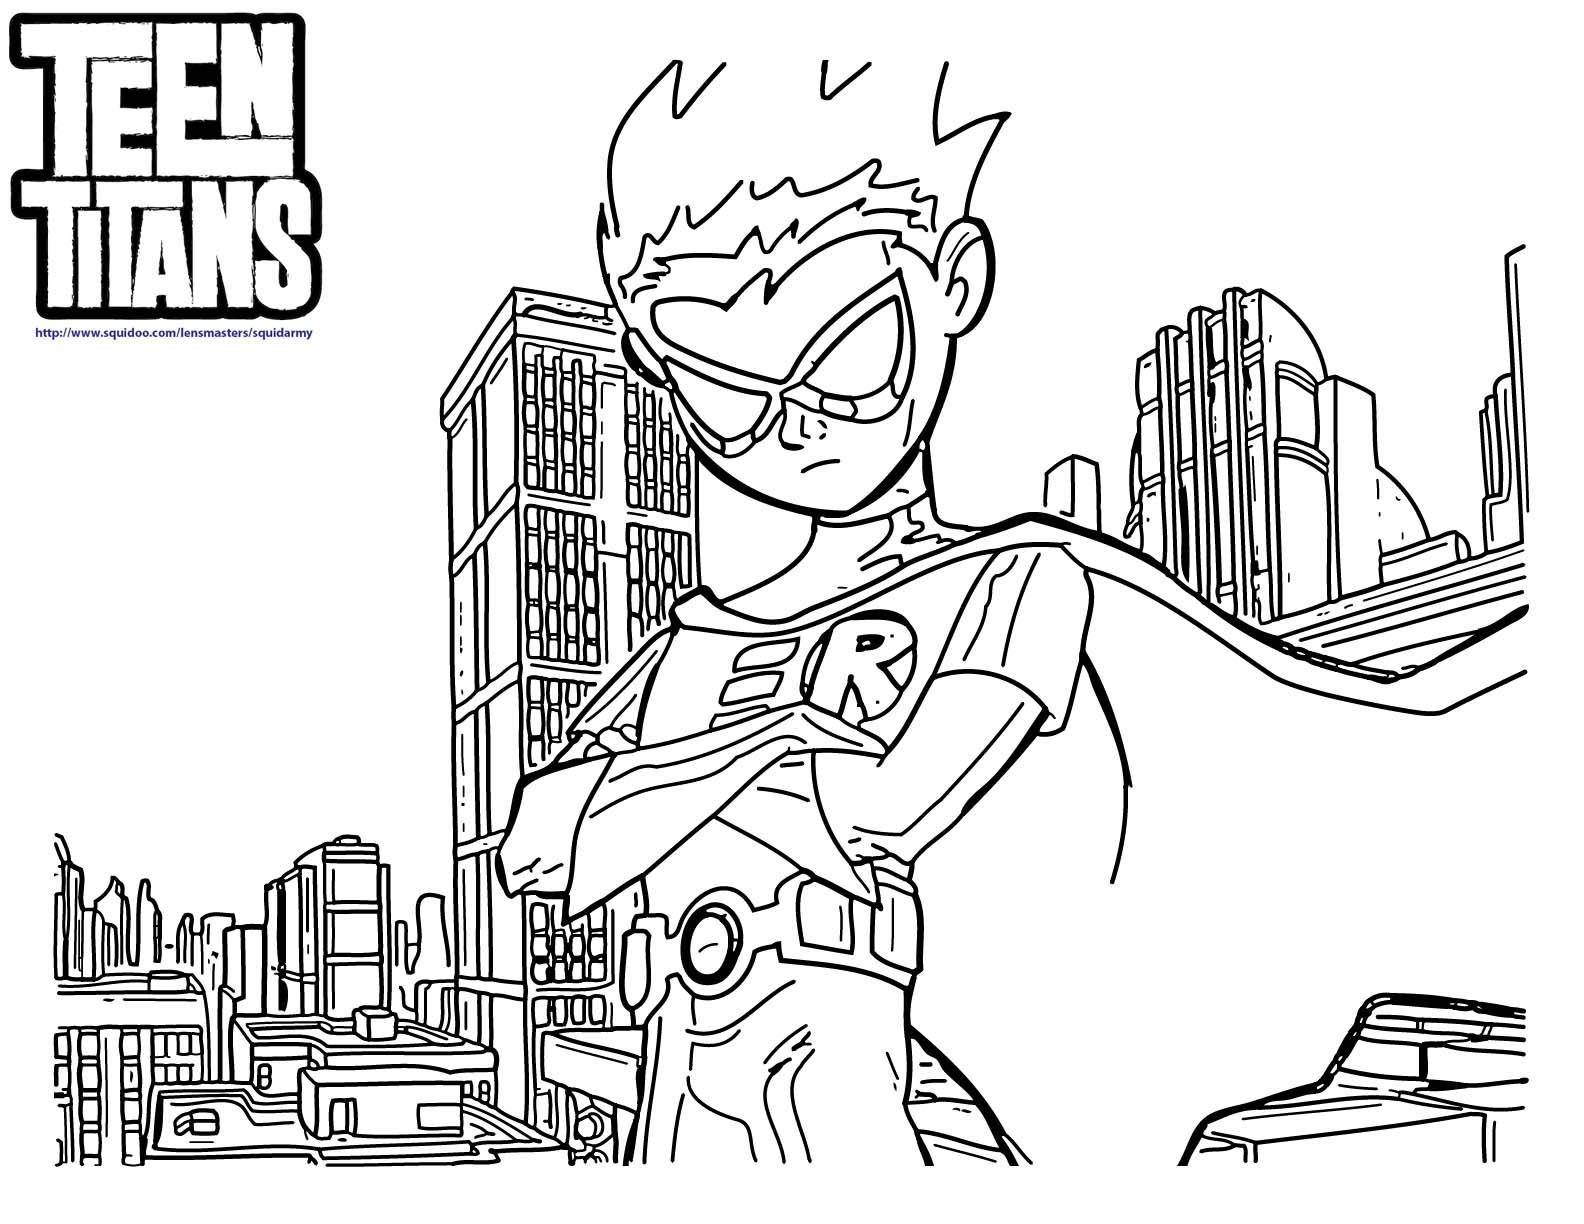 teen titans coloring pages teen titans coloring pages best coloring pages for kids coloring pages titans teen